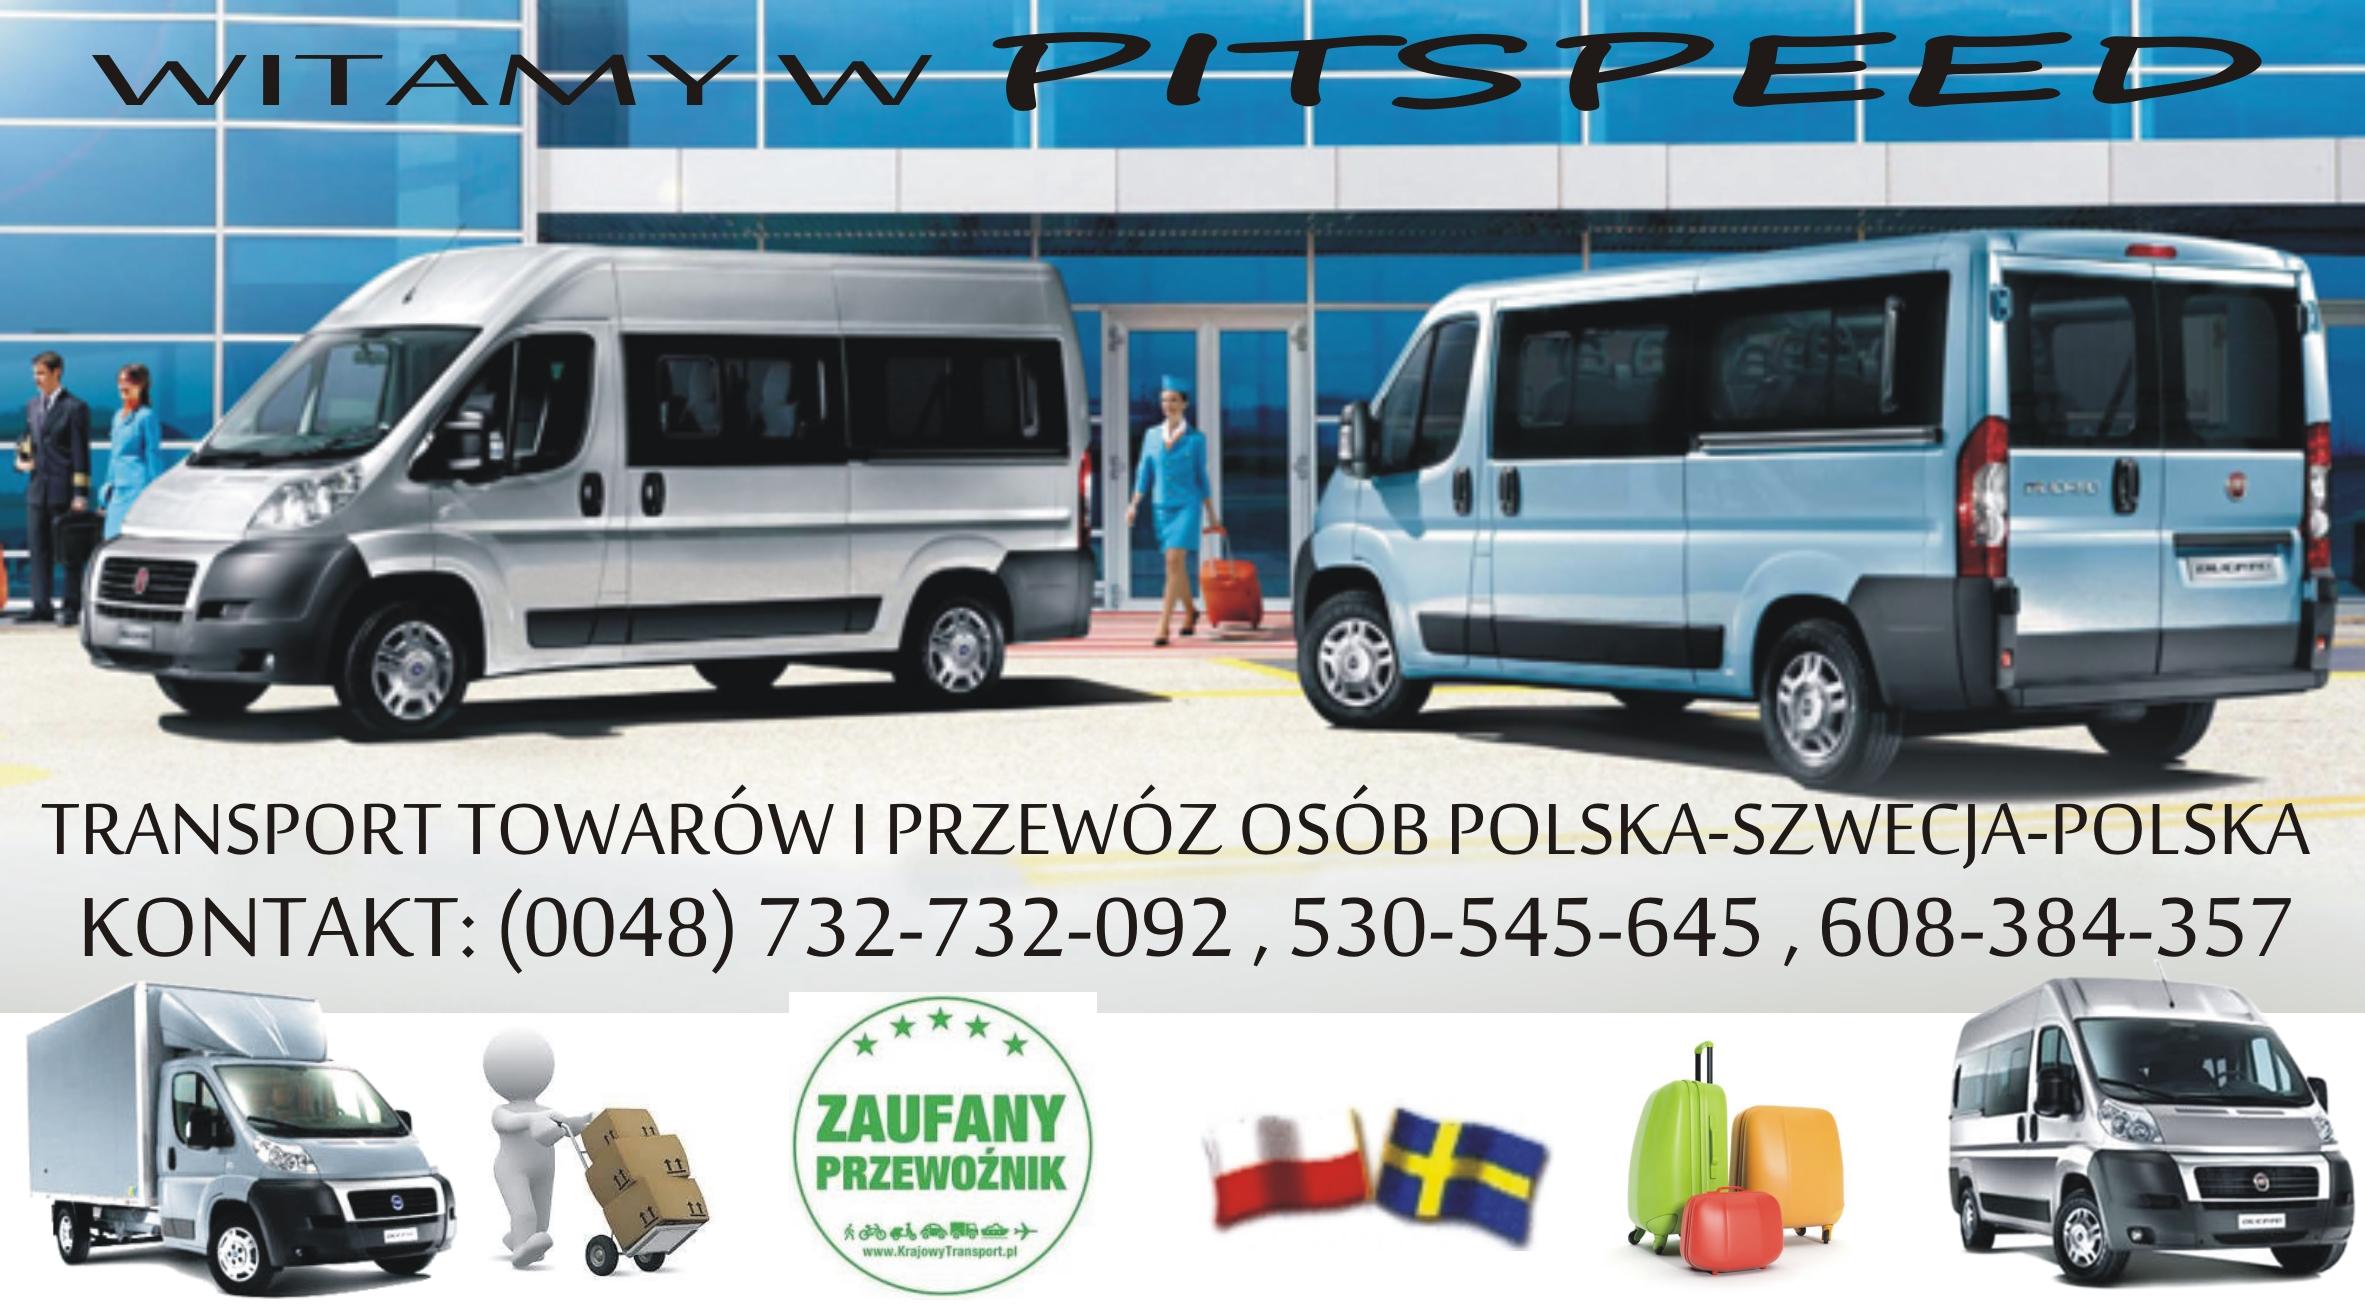 http://krajowytransport.pl/images/zdjd/gotowiec.jpg